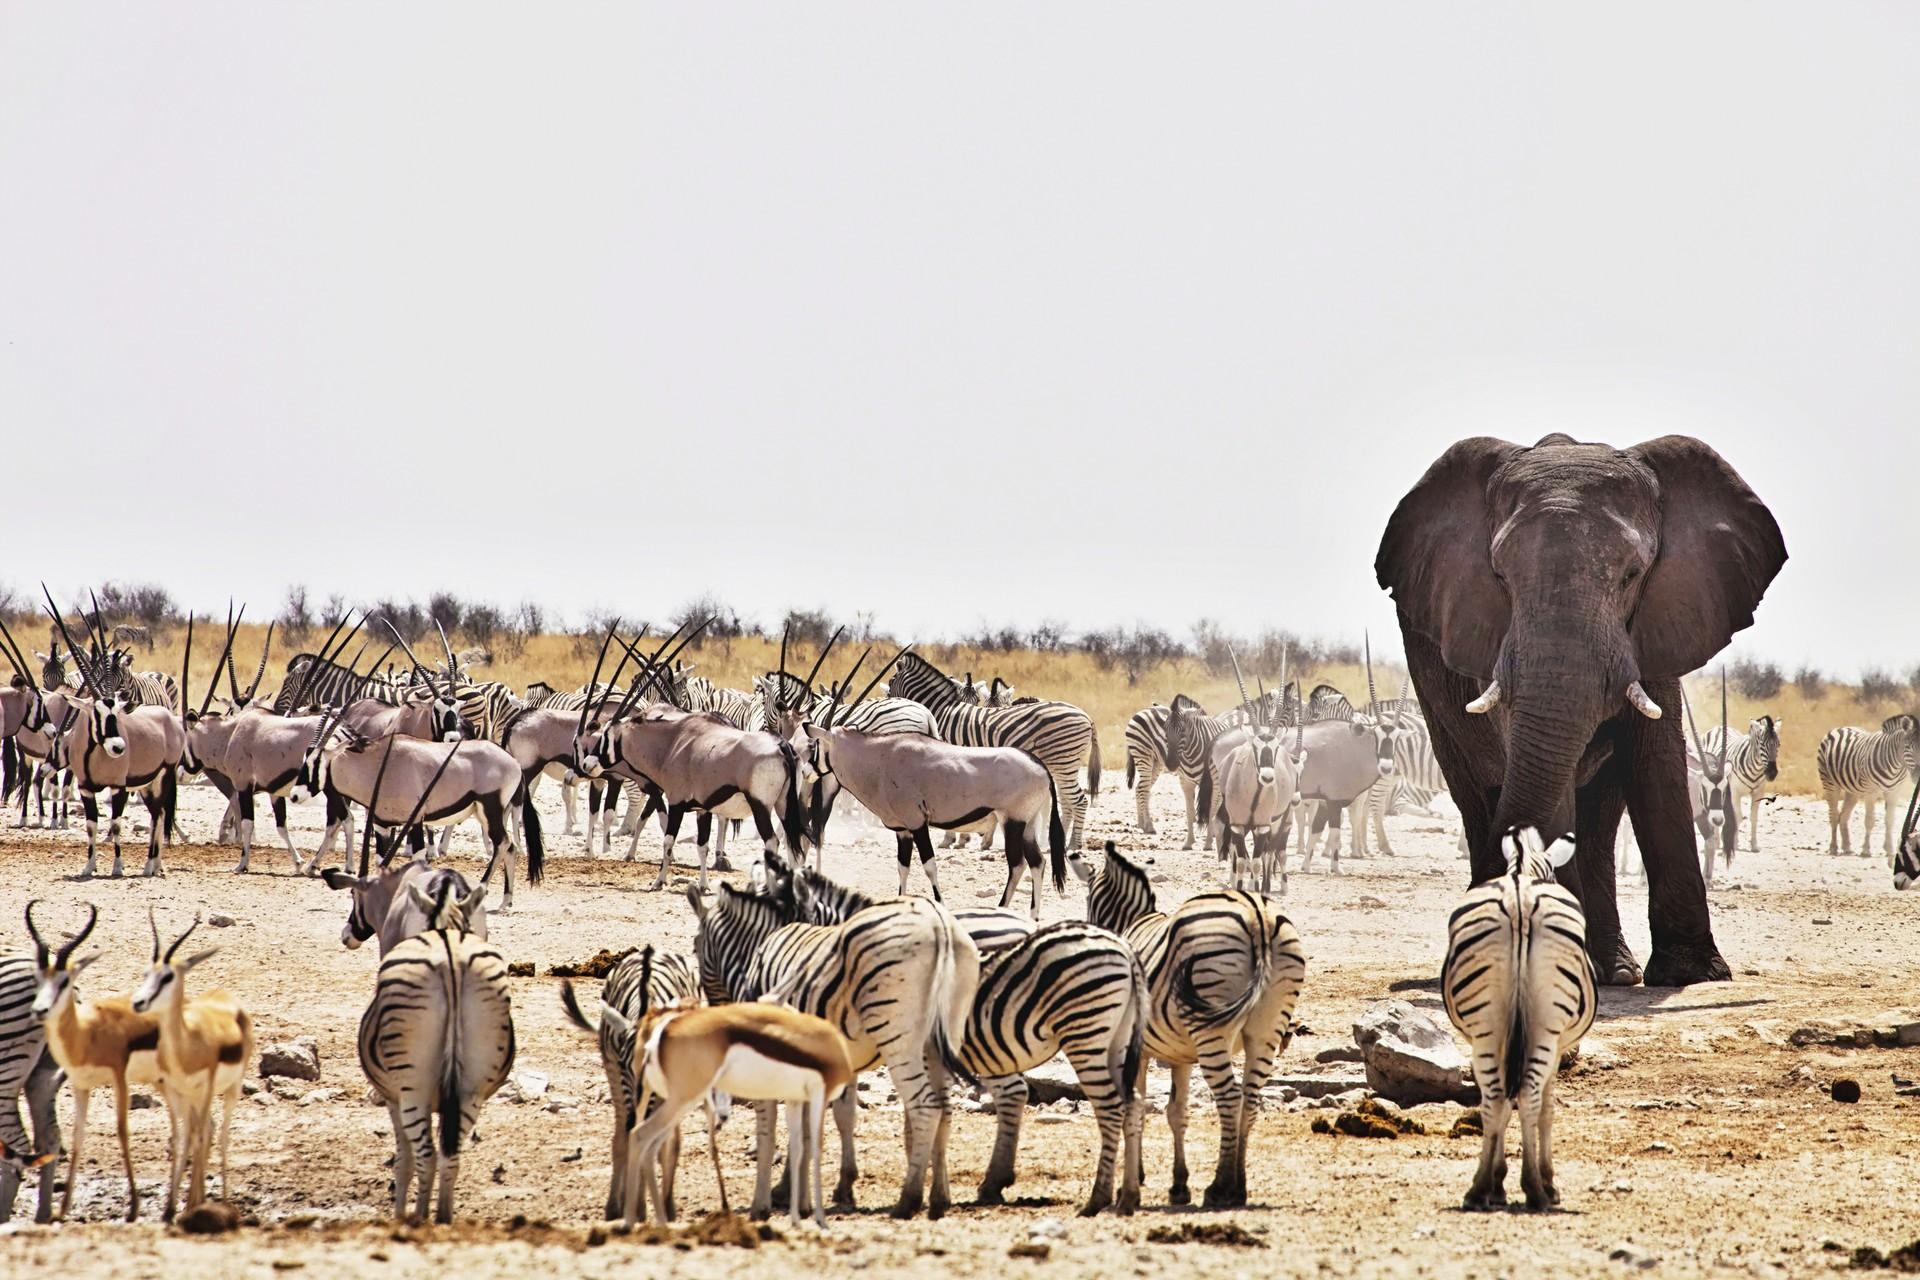 An elephant alongside zebras and oryxes in Etosha National Park